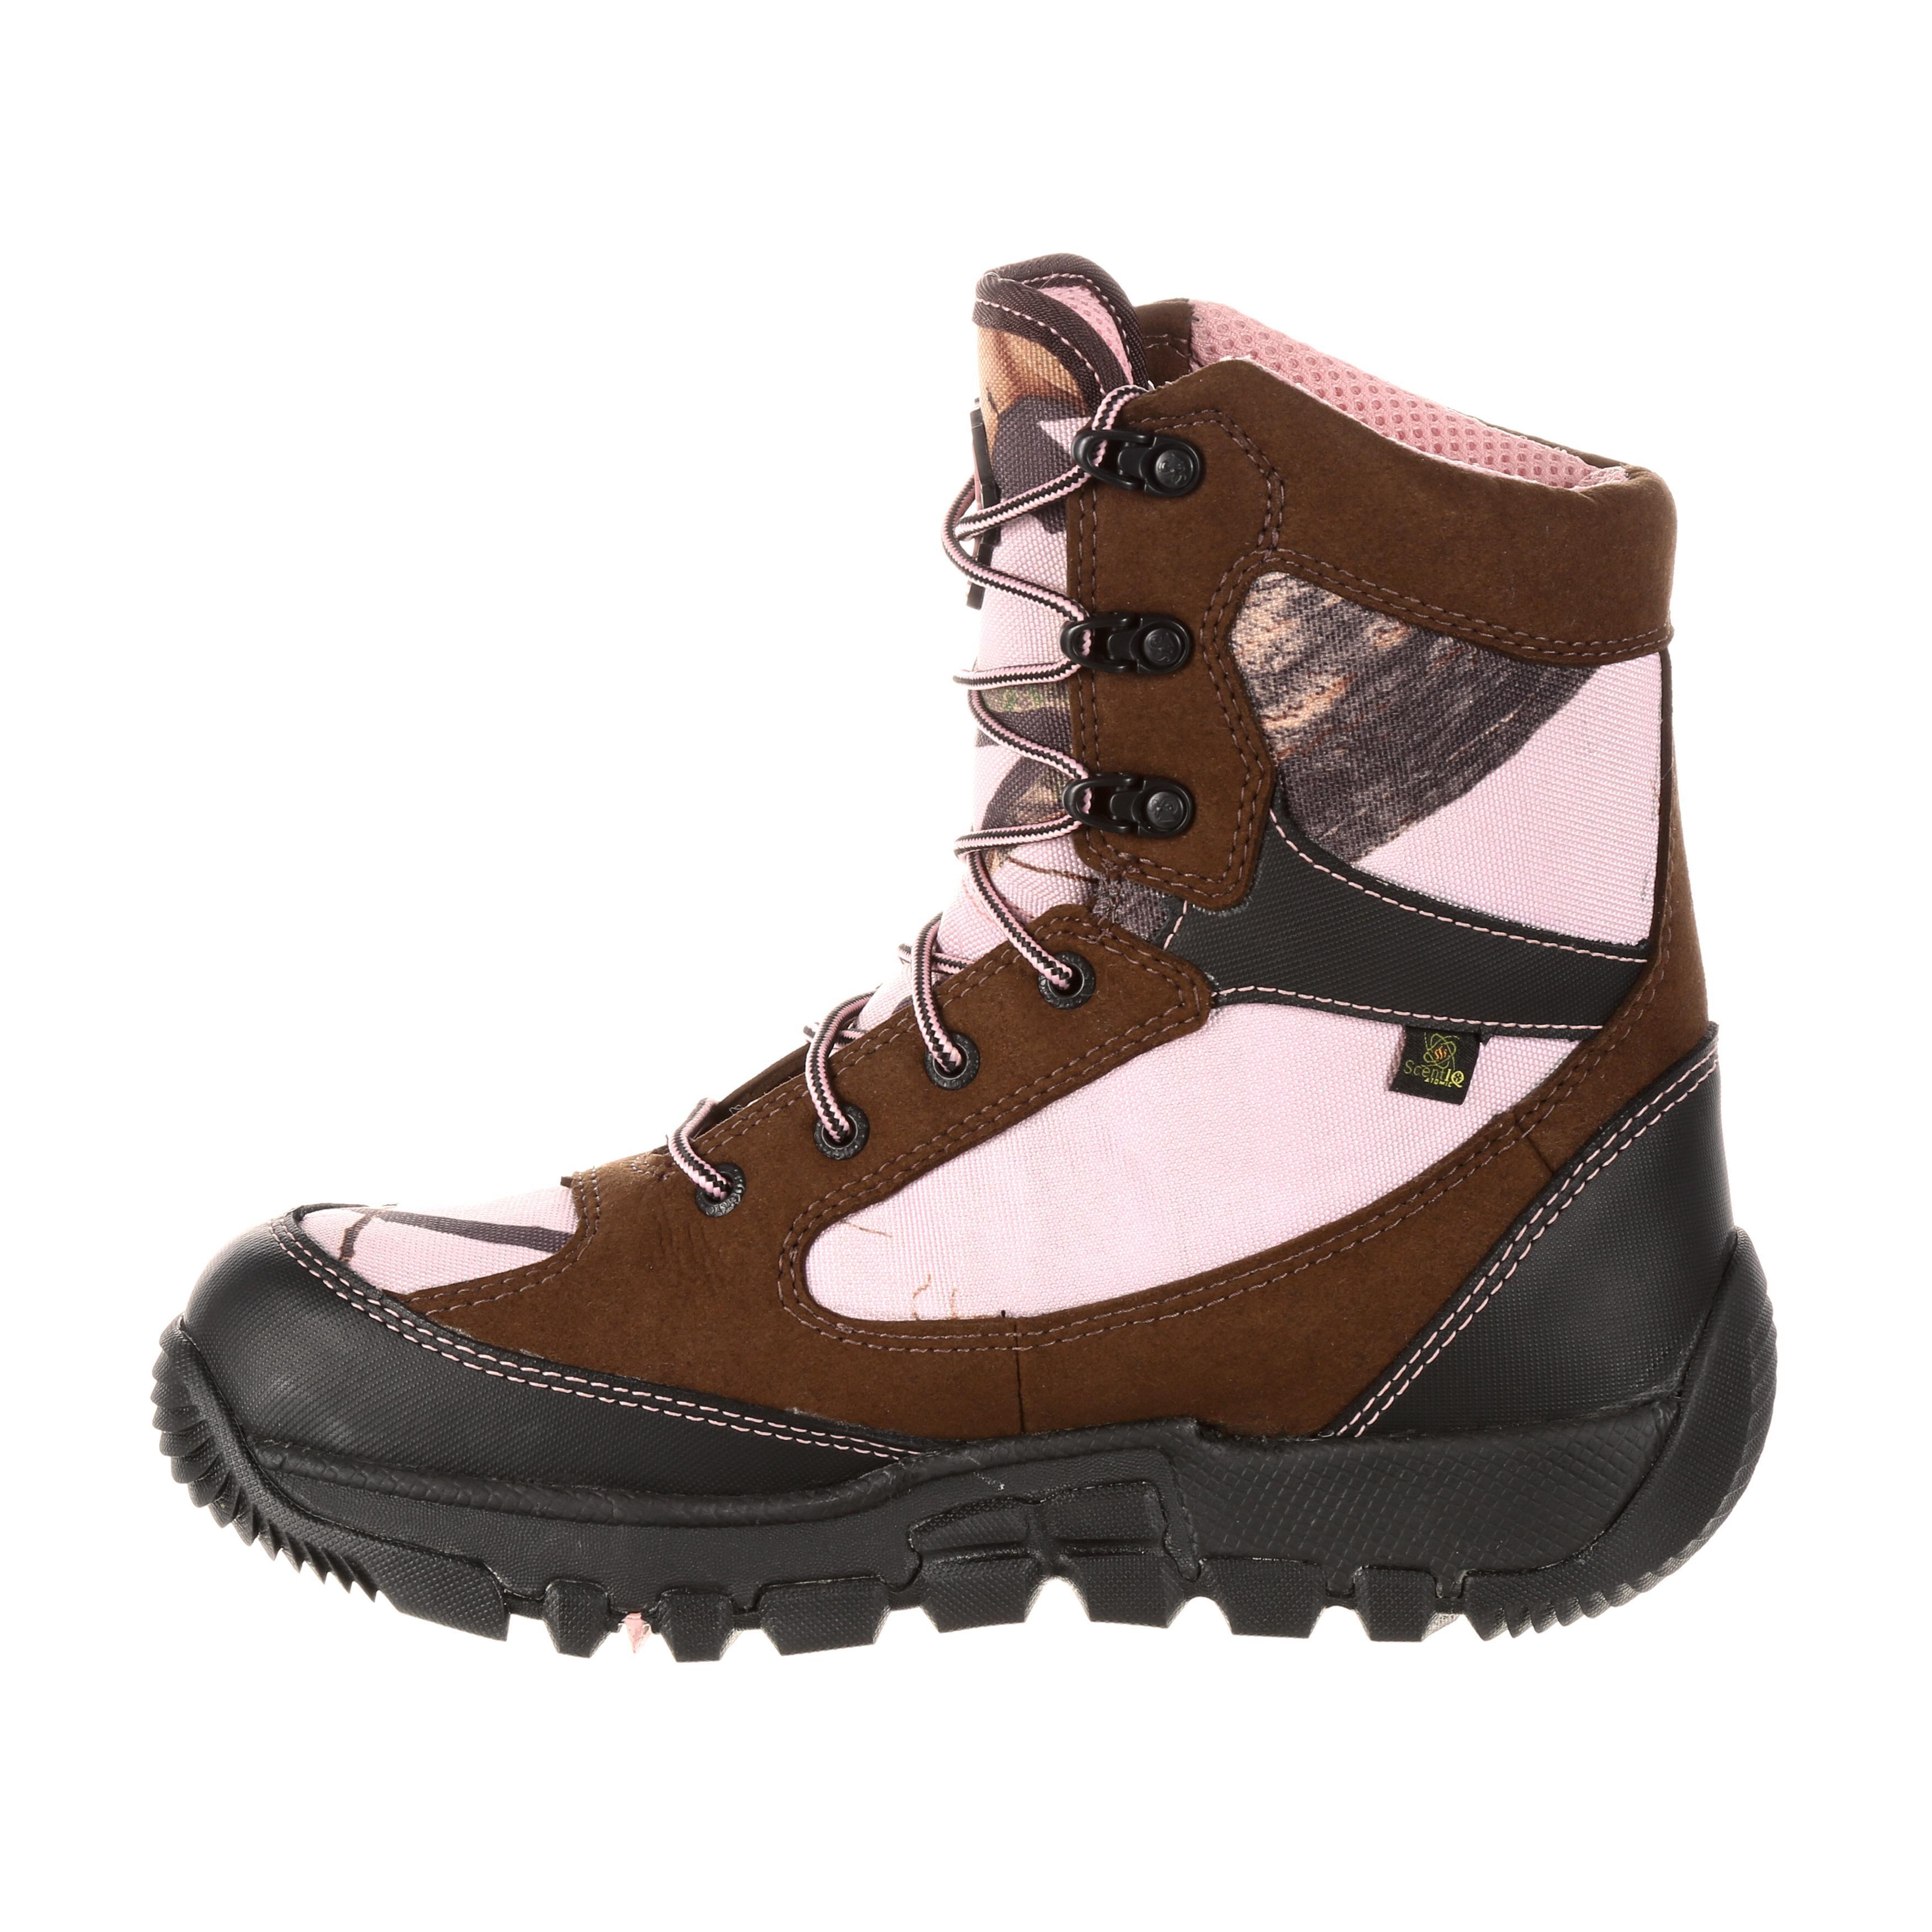 e6e788d2b4c Rocky Women's Waterproof Insulated Camo Outdoor Boot